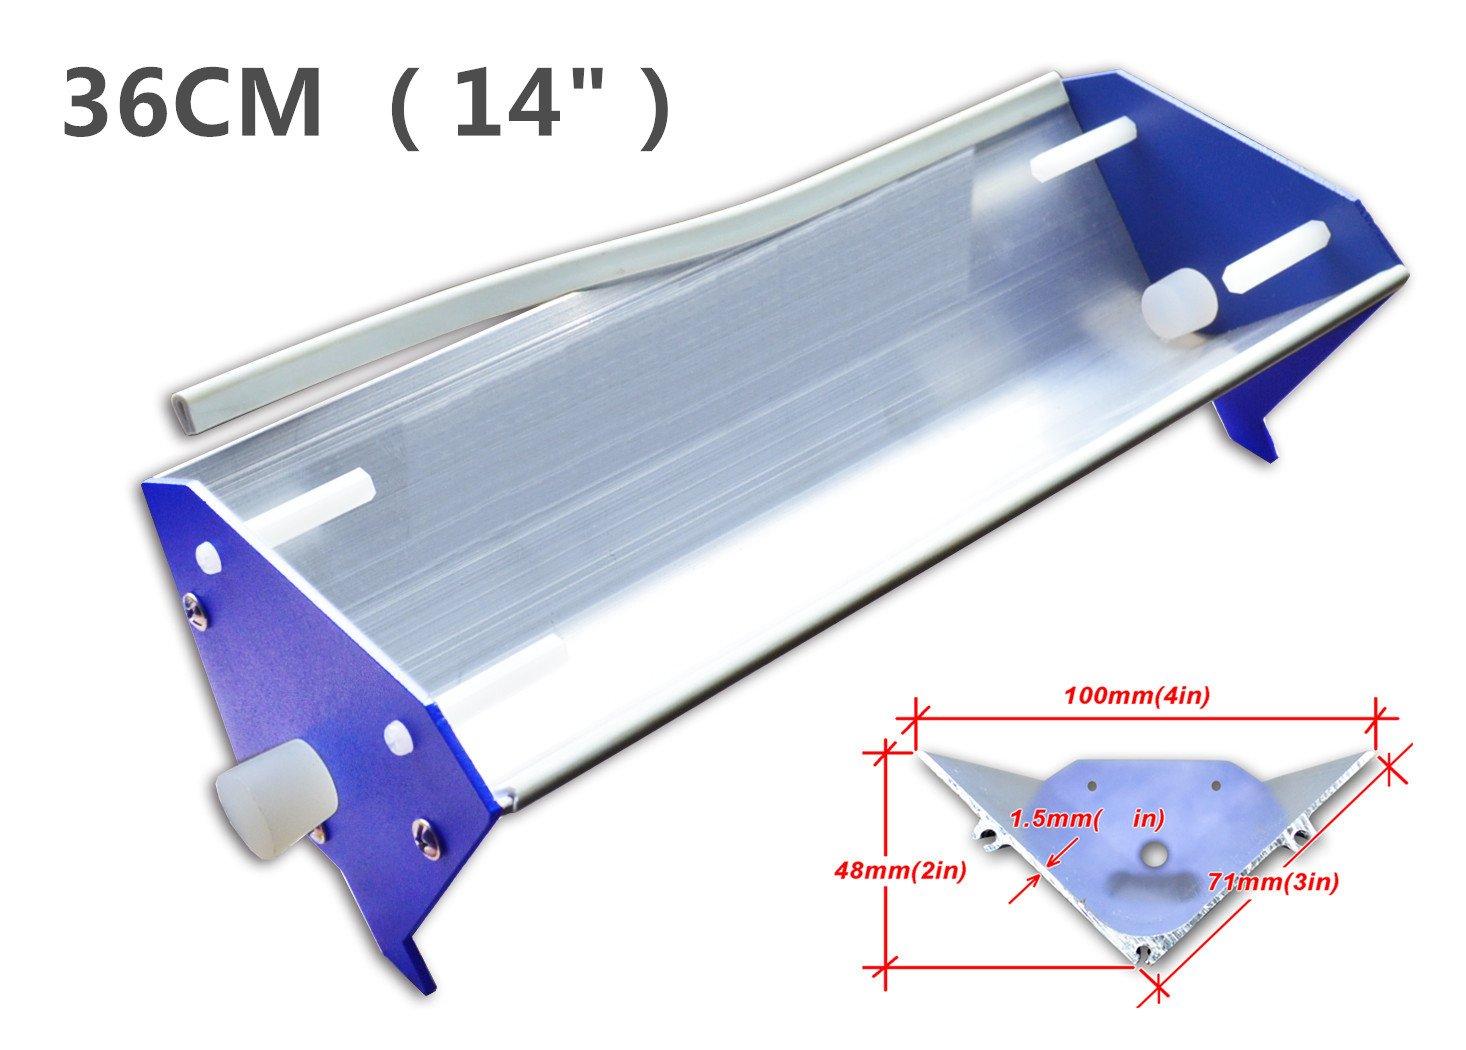 Emulsion Scoop Coater Silk Screen Printing Aluminum Coating Tools DIY Apply (14 inch (36 cm)) by TJGS